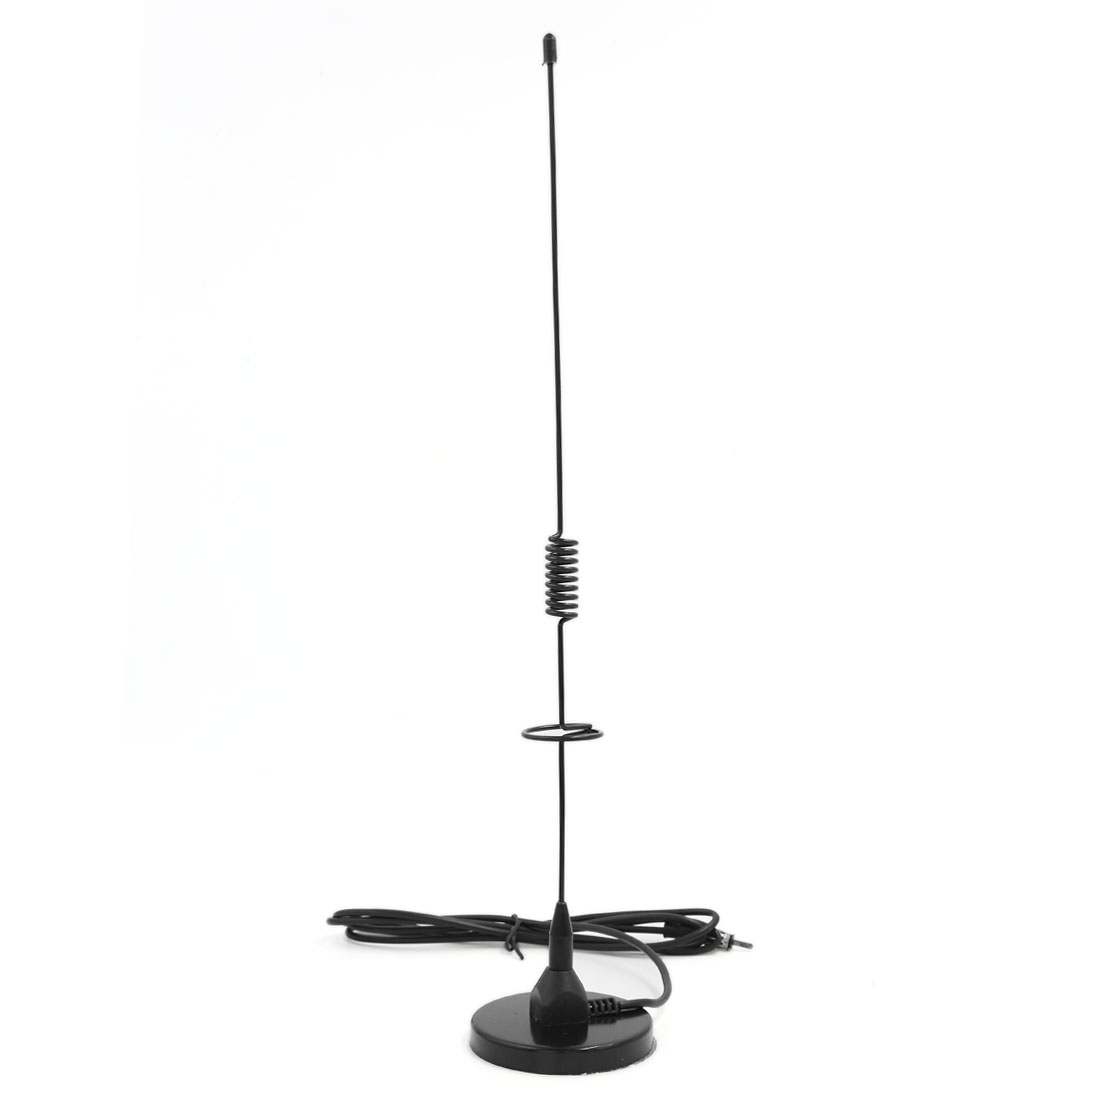 Universal Car Auto Magnetic Base FM/AM Radio Signal Antenna Aerial 45cm Long